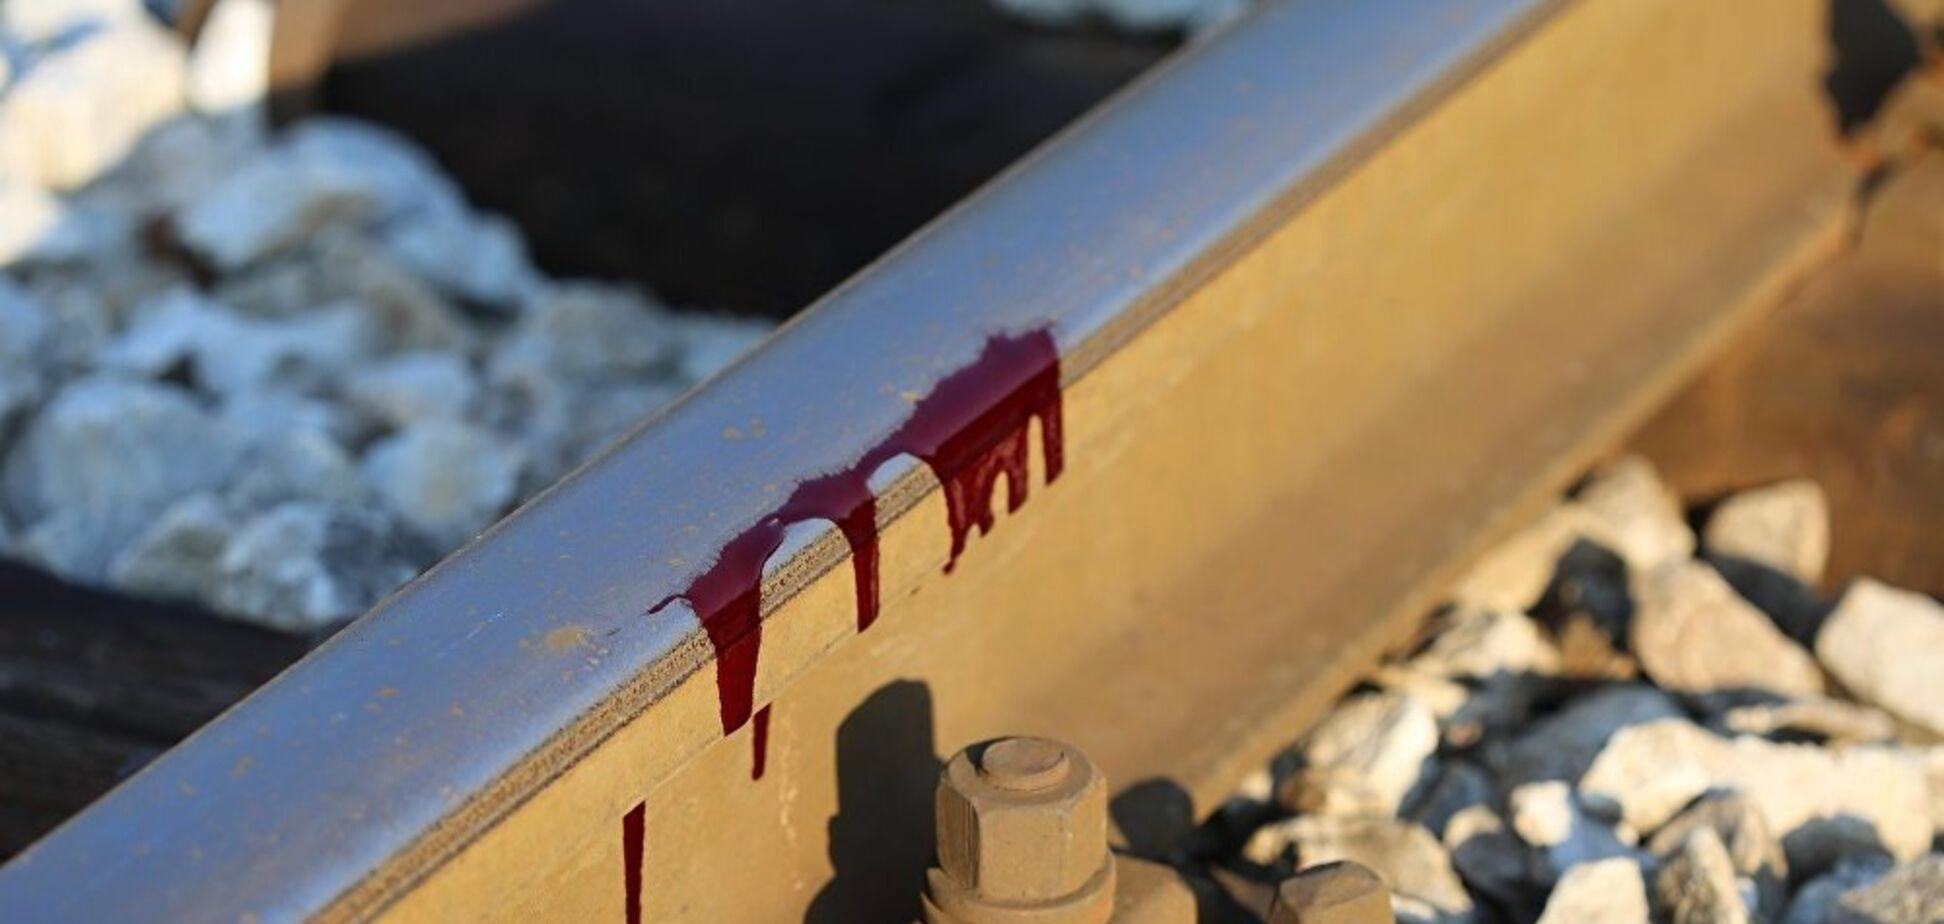 В Днепре поезд задавил мужчину: фото и видео 18+